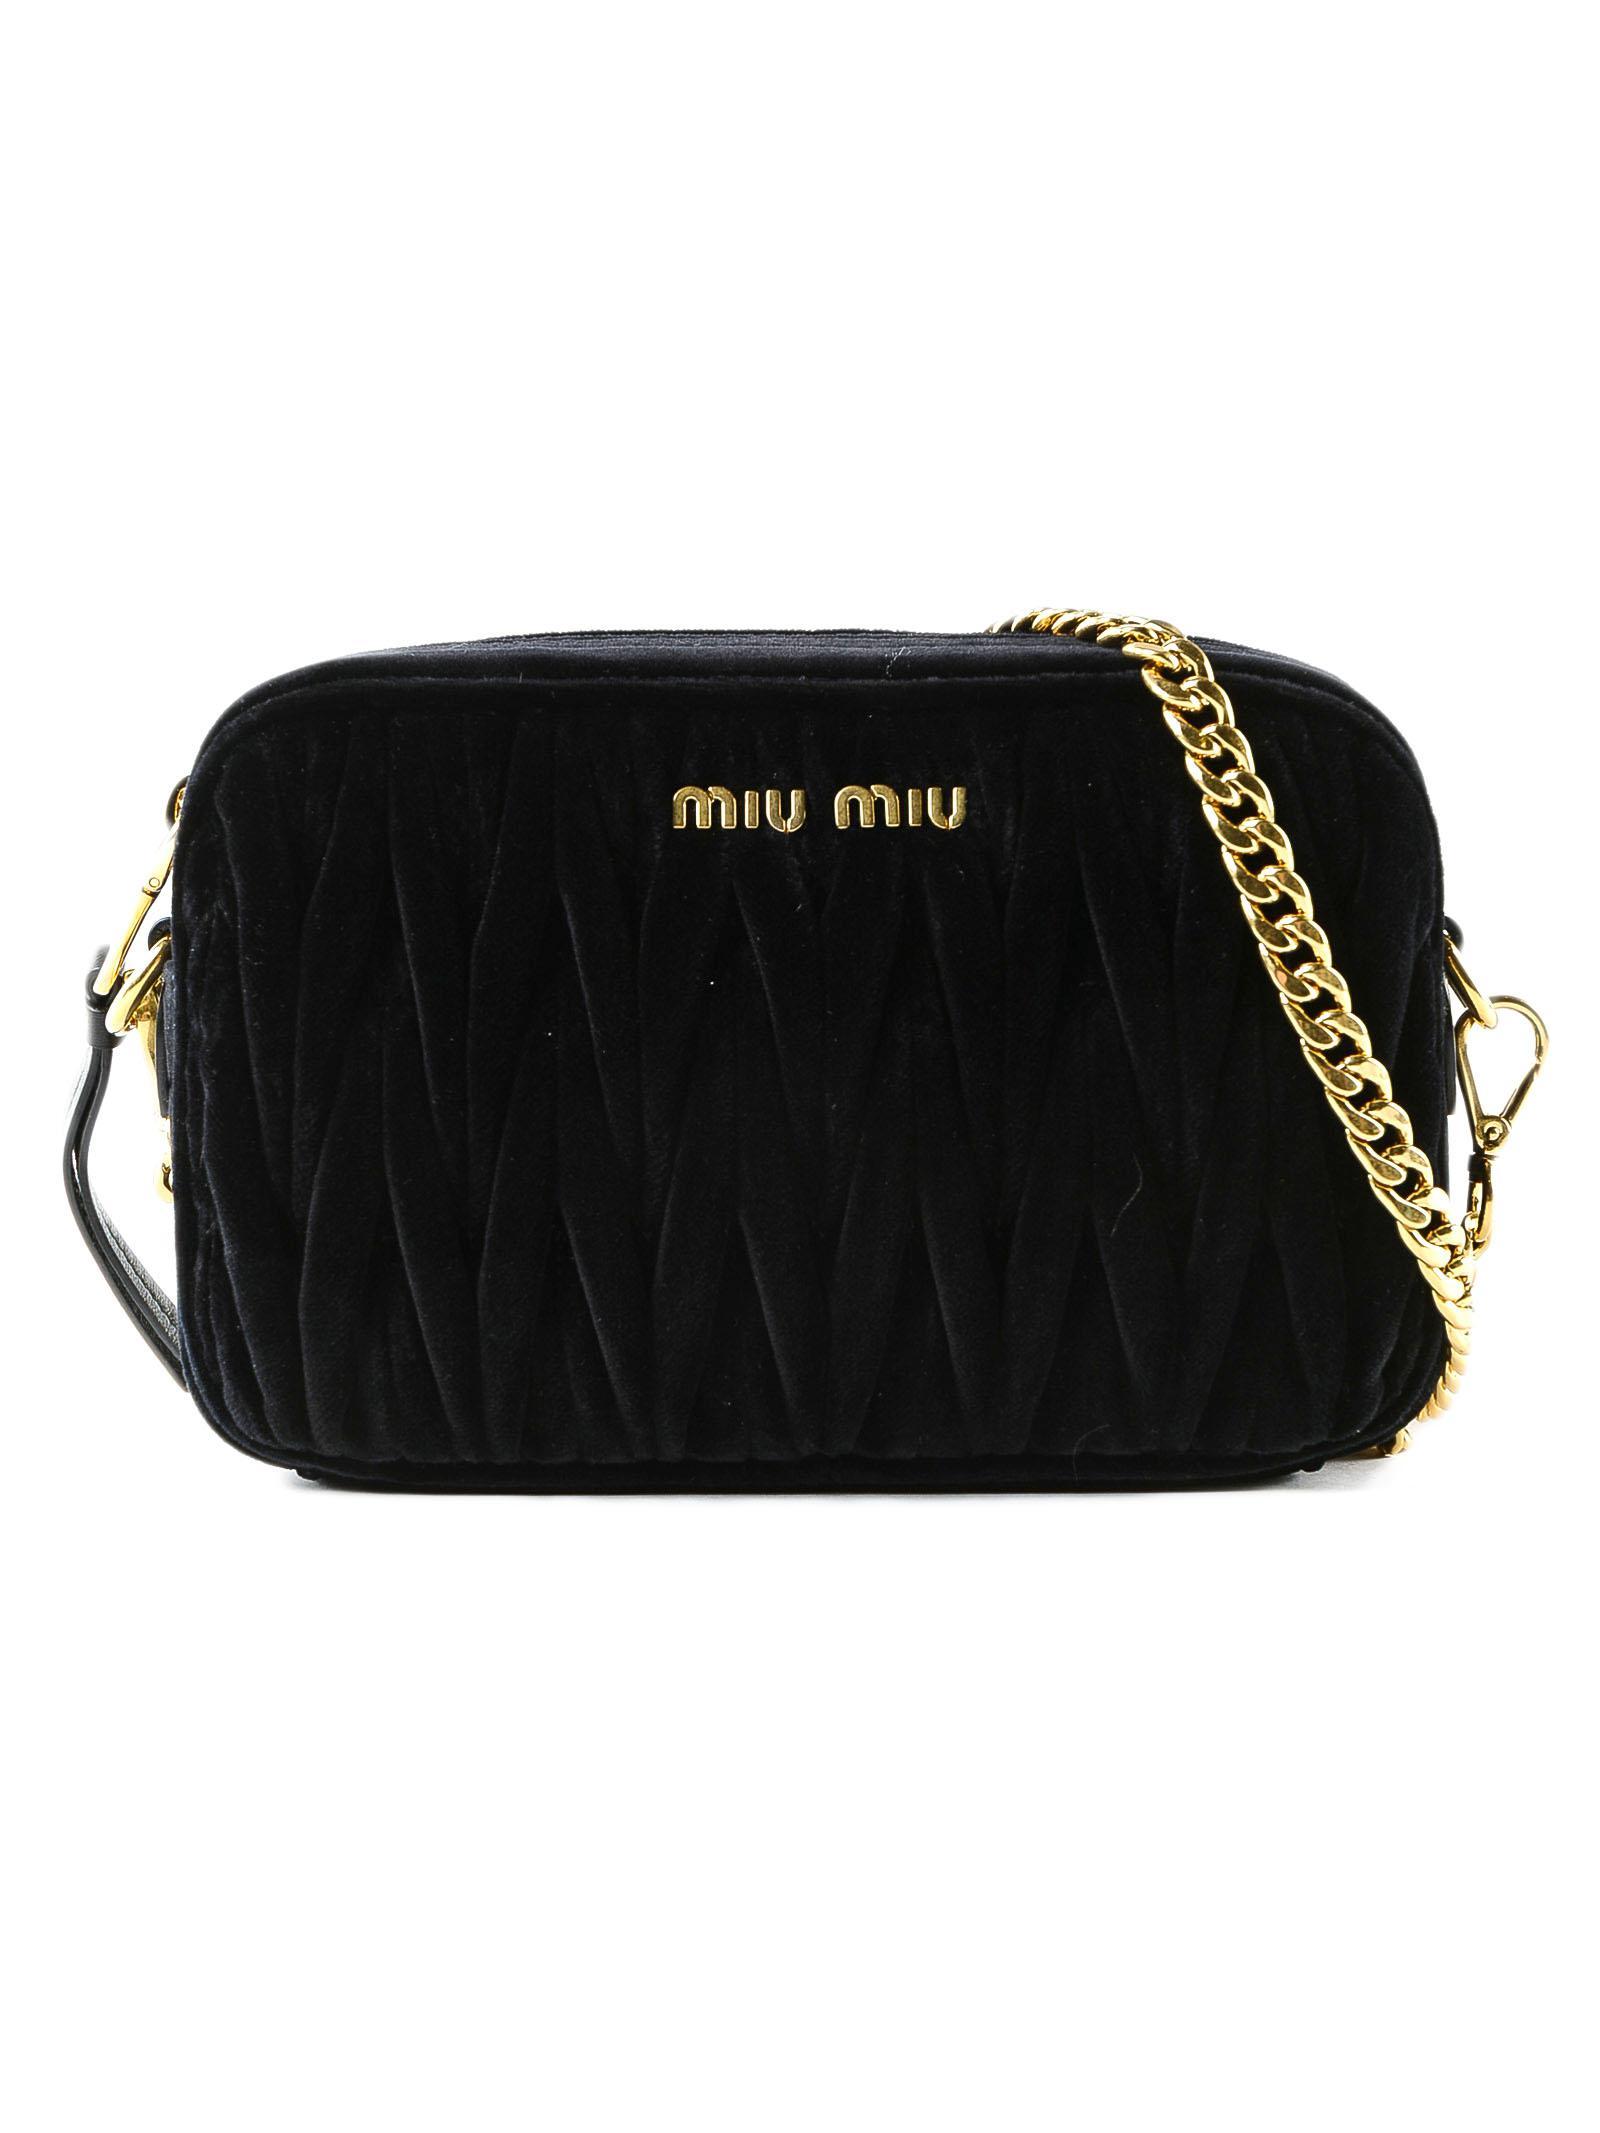 45feb25129e9 Miu Miu - Black Velvet Crossbody Bag - Lyst. View fullscreen